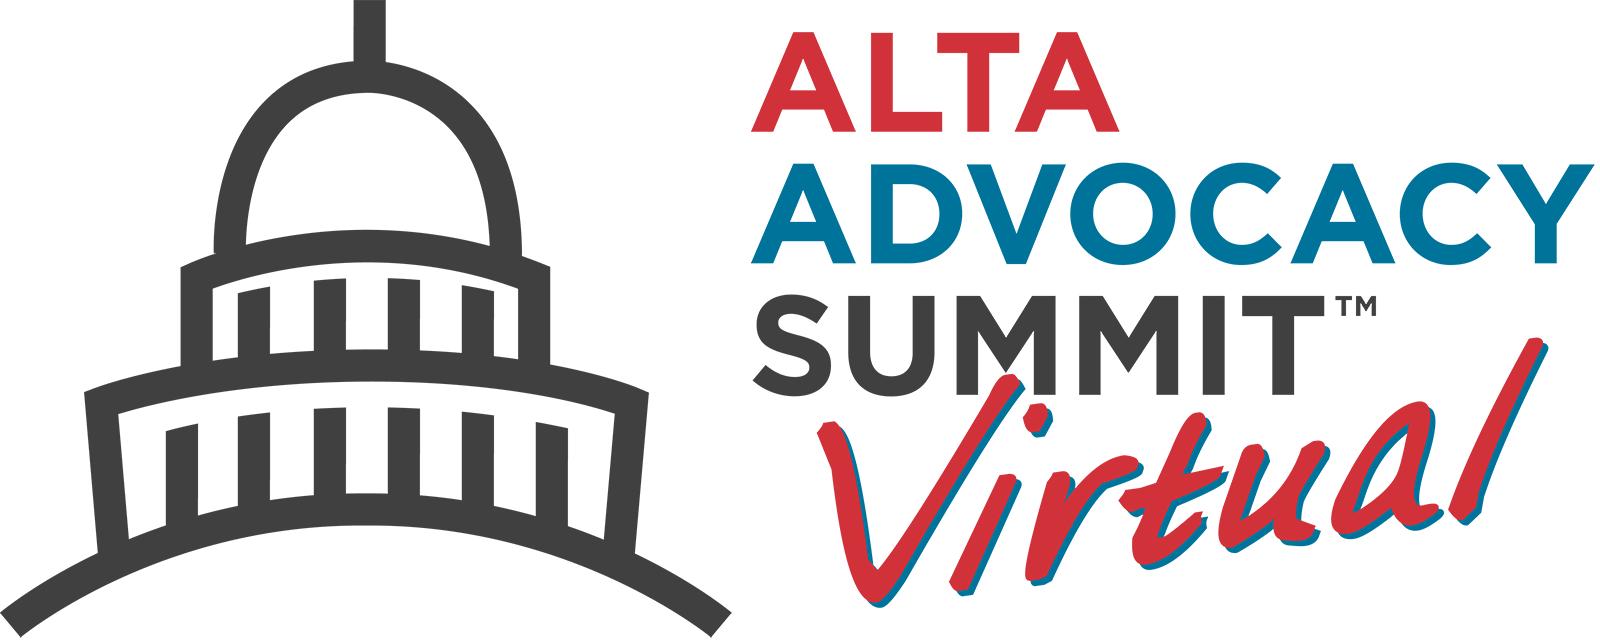 ALTA 2020 Advocacy Summit